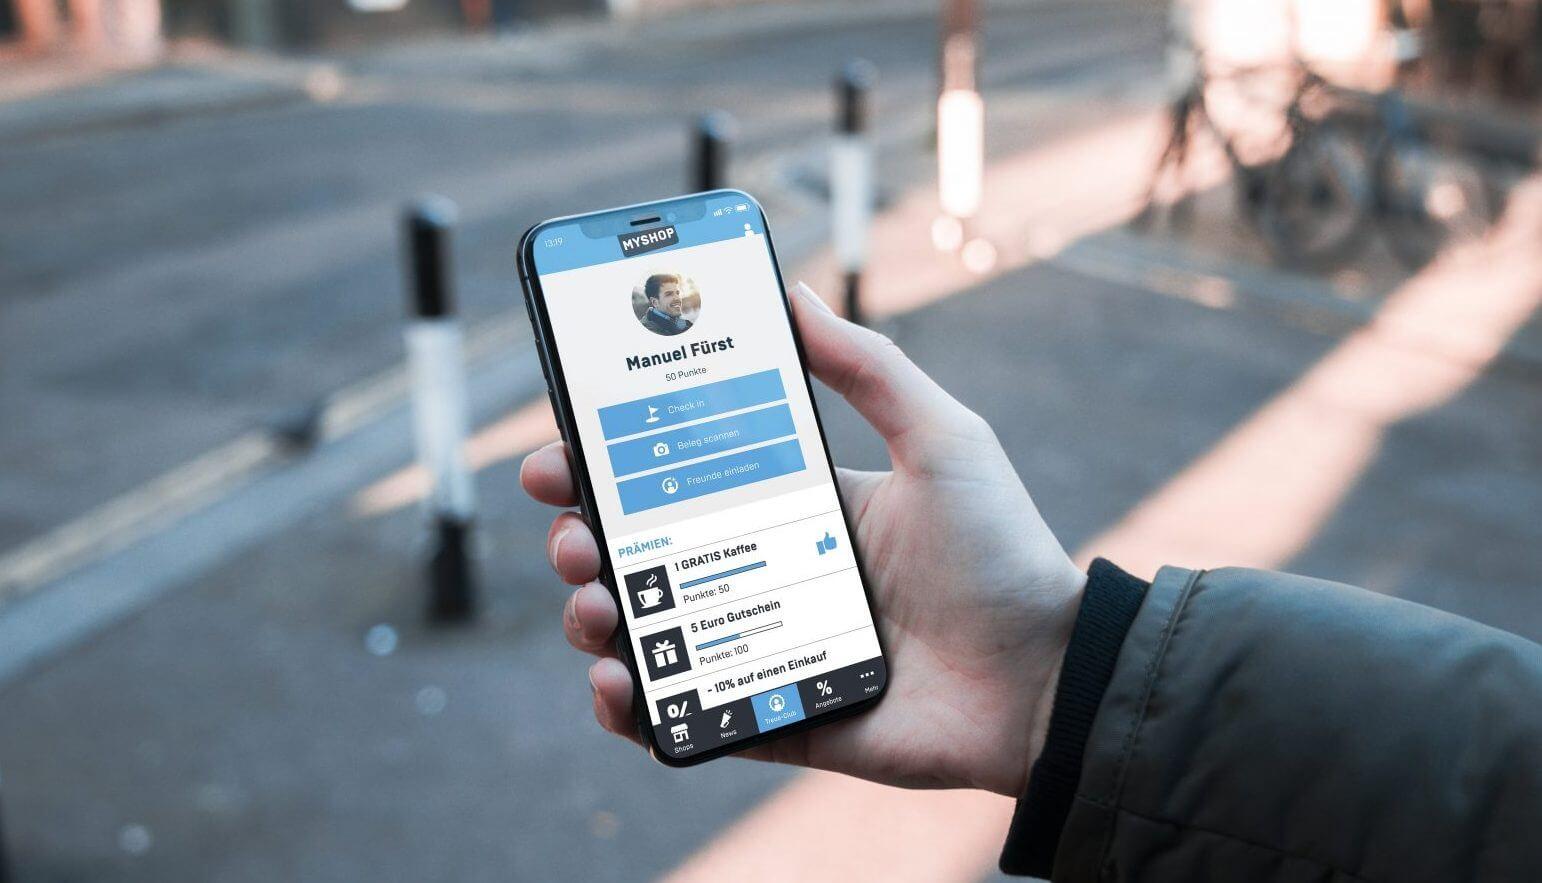 Image_Smartphone in der Hand